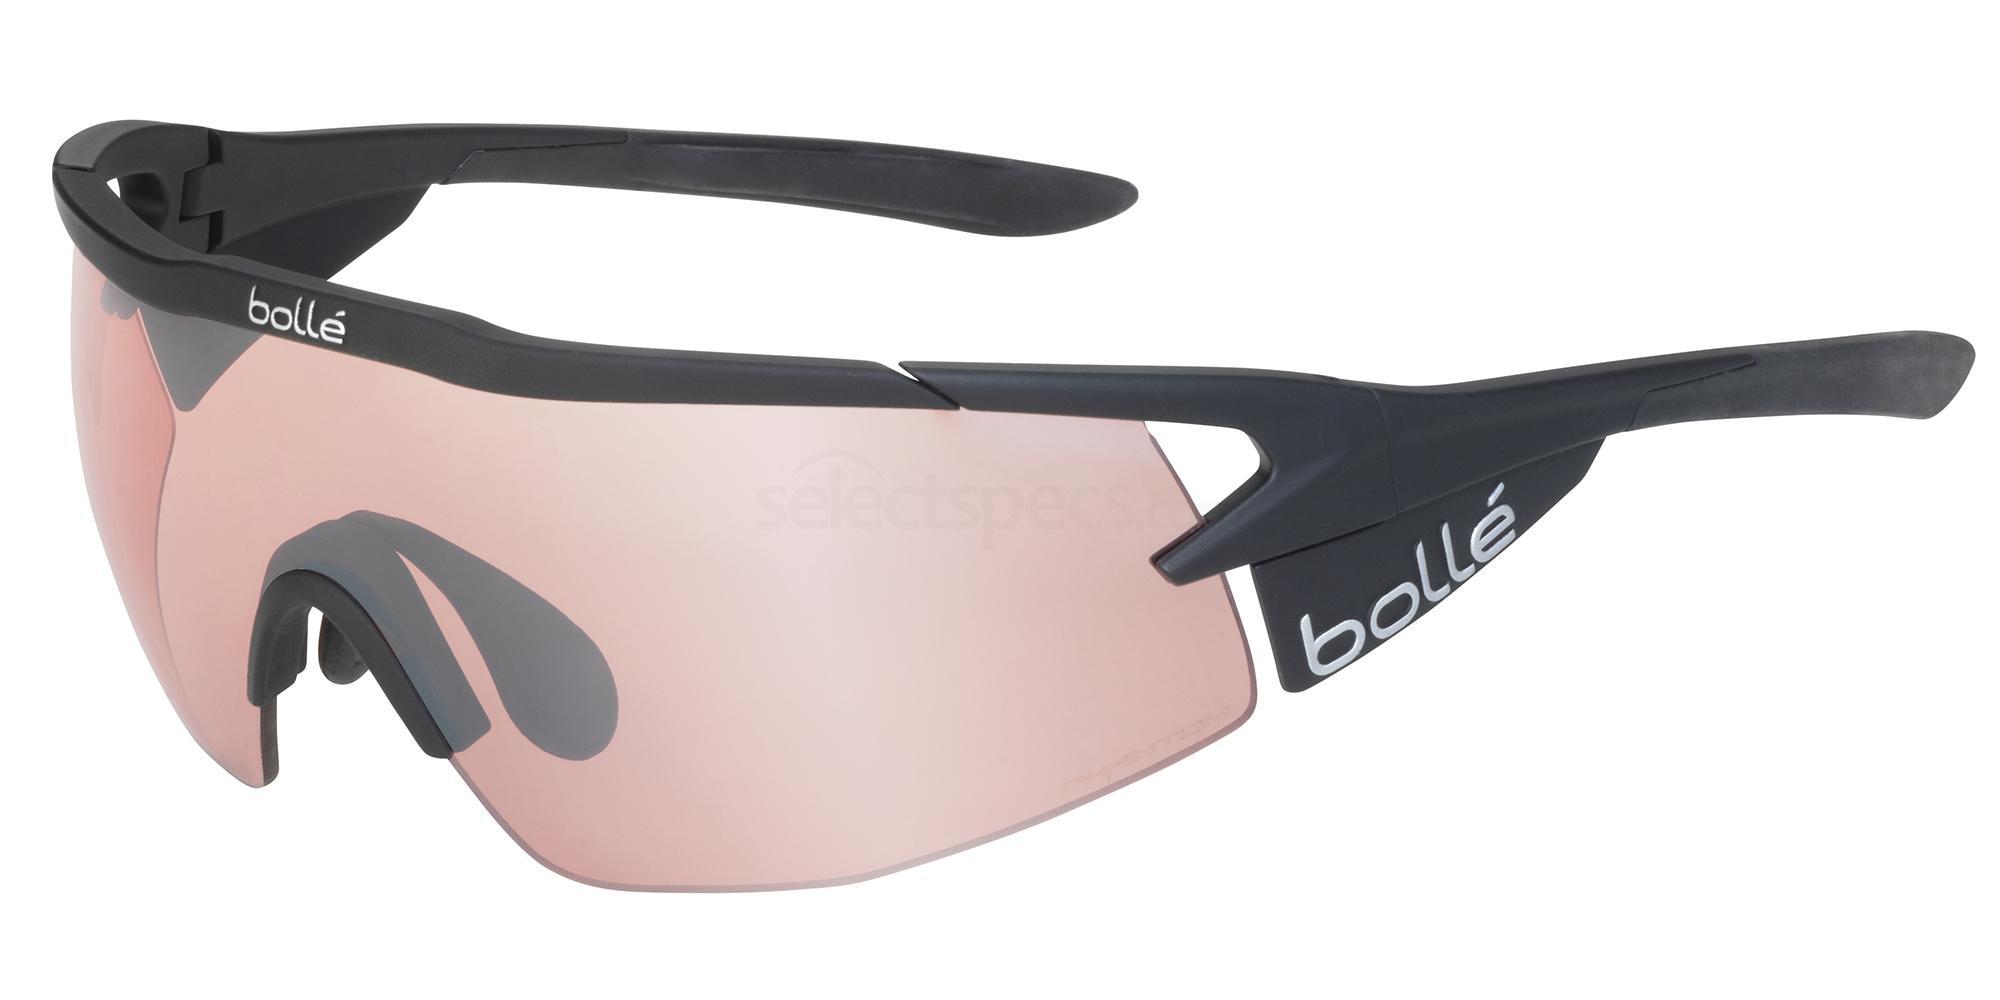 ugly sunglasses trend 2021 sports eyewear bolle